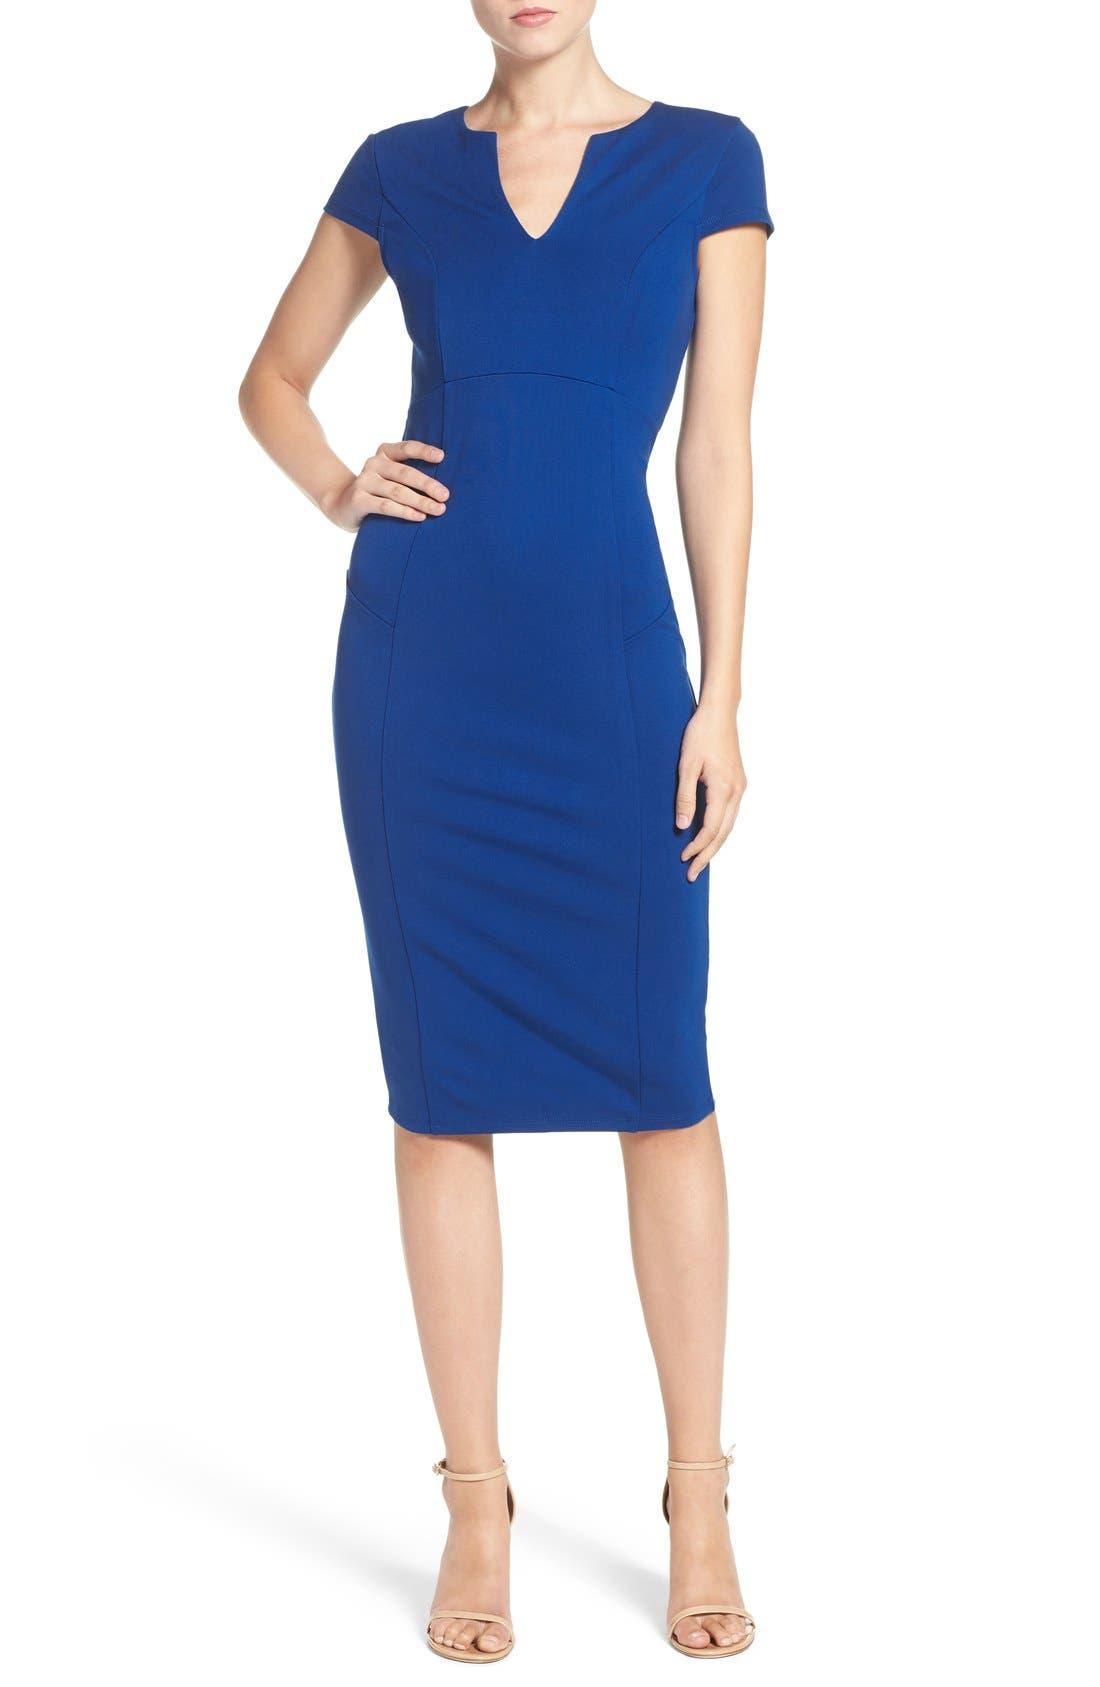 Main Image - Felicity & Coco V-Neck Ponte Knit Midi Sheath Dress (Regular & Petite) (Nordstrom Exclusive)